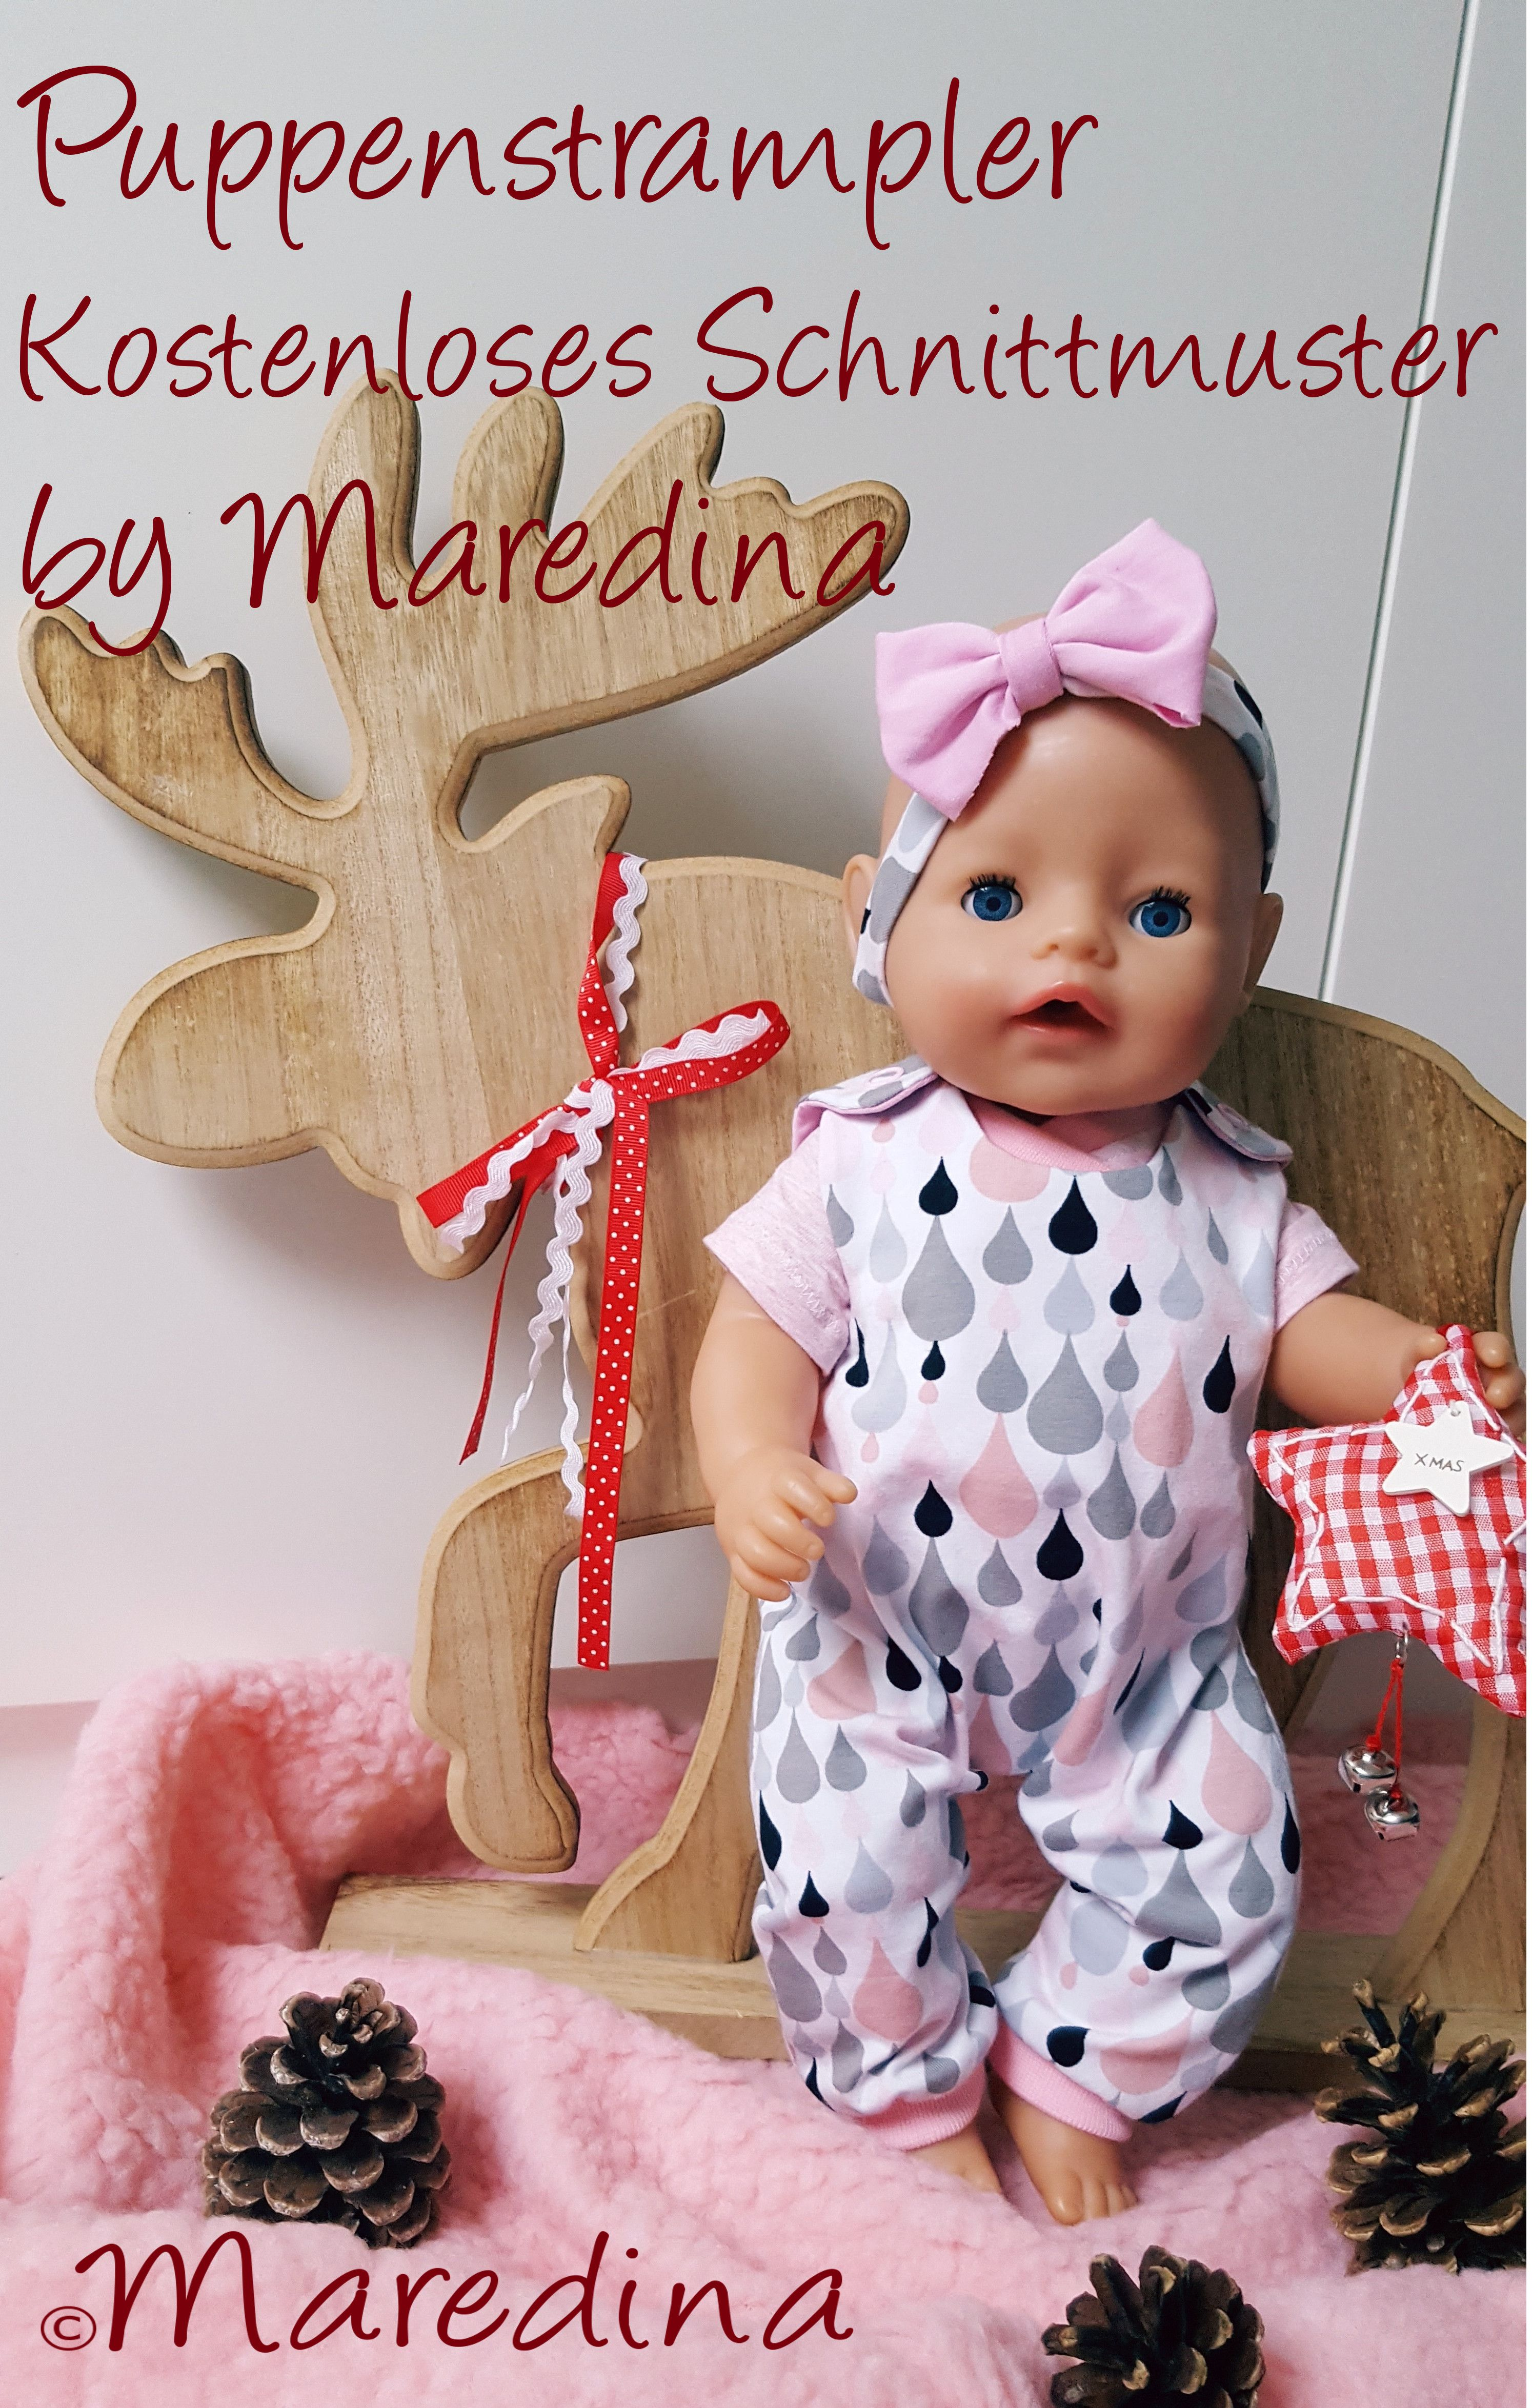 Puppenstrampler – by Maredina